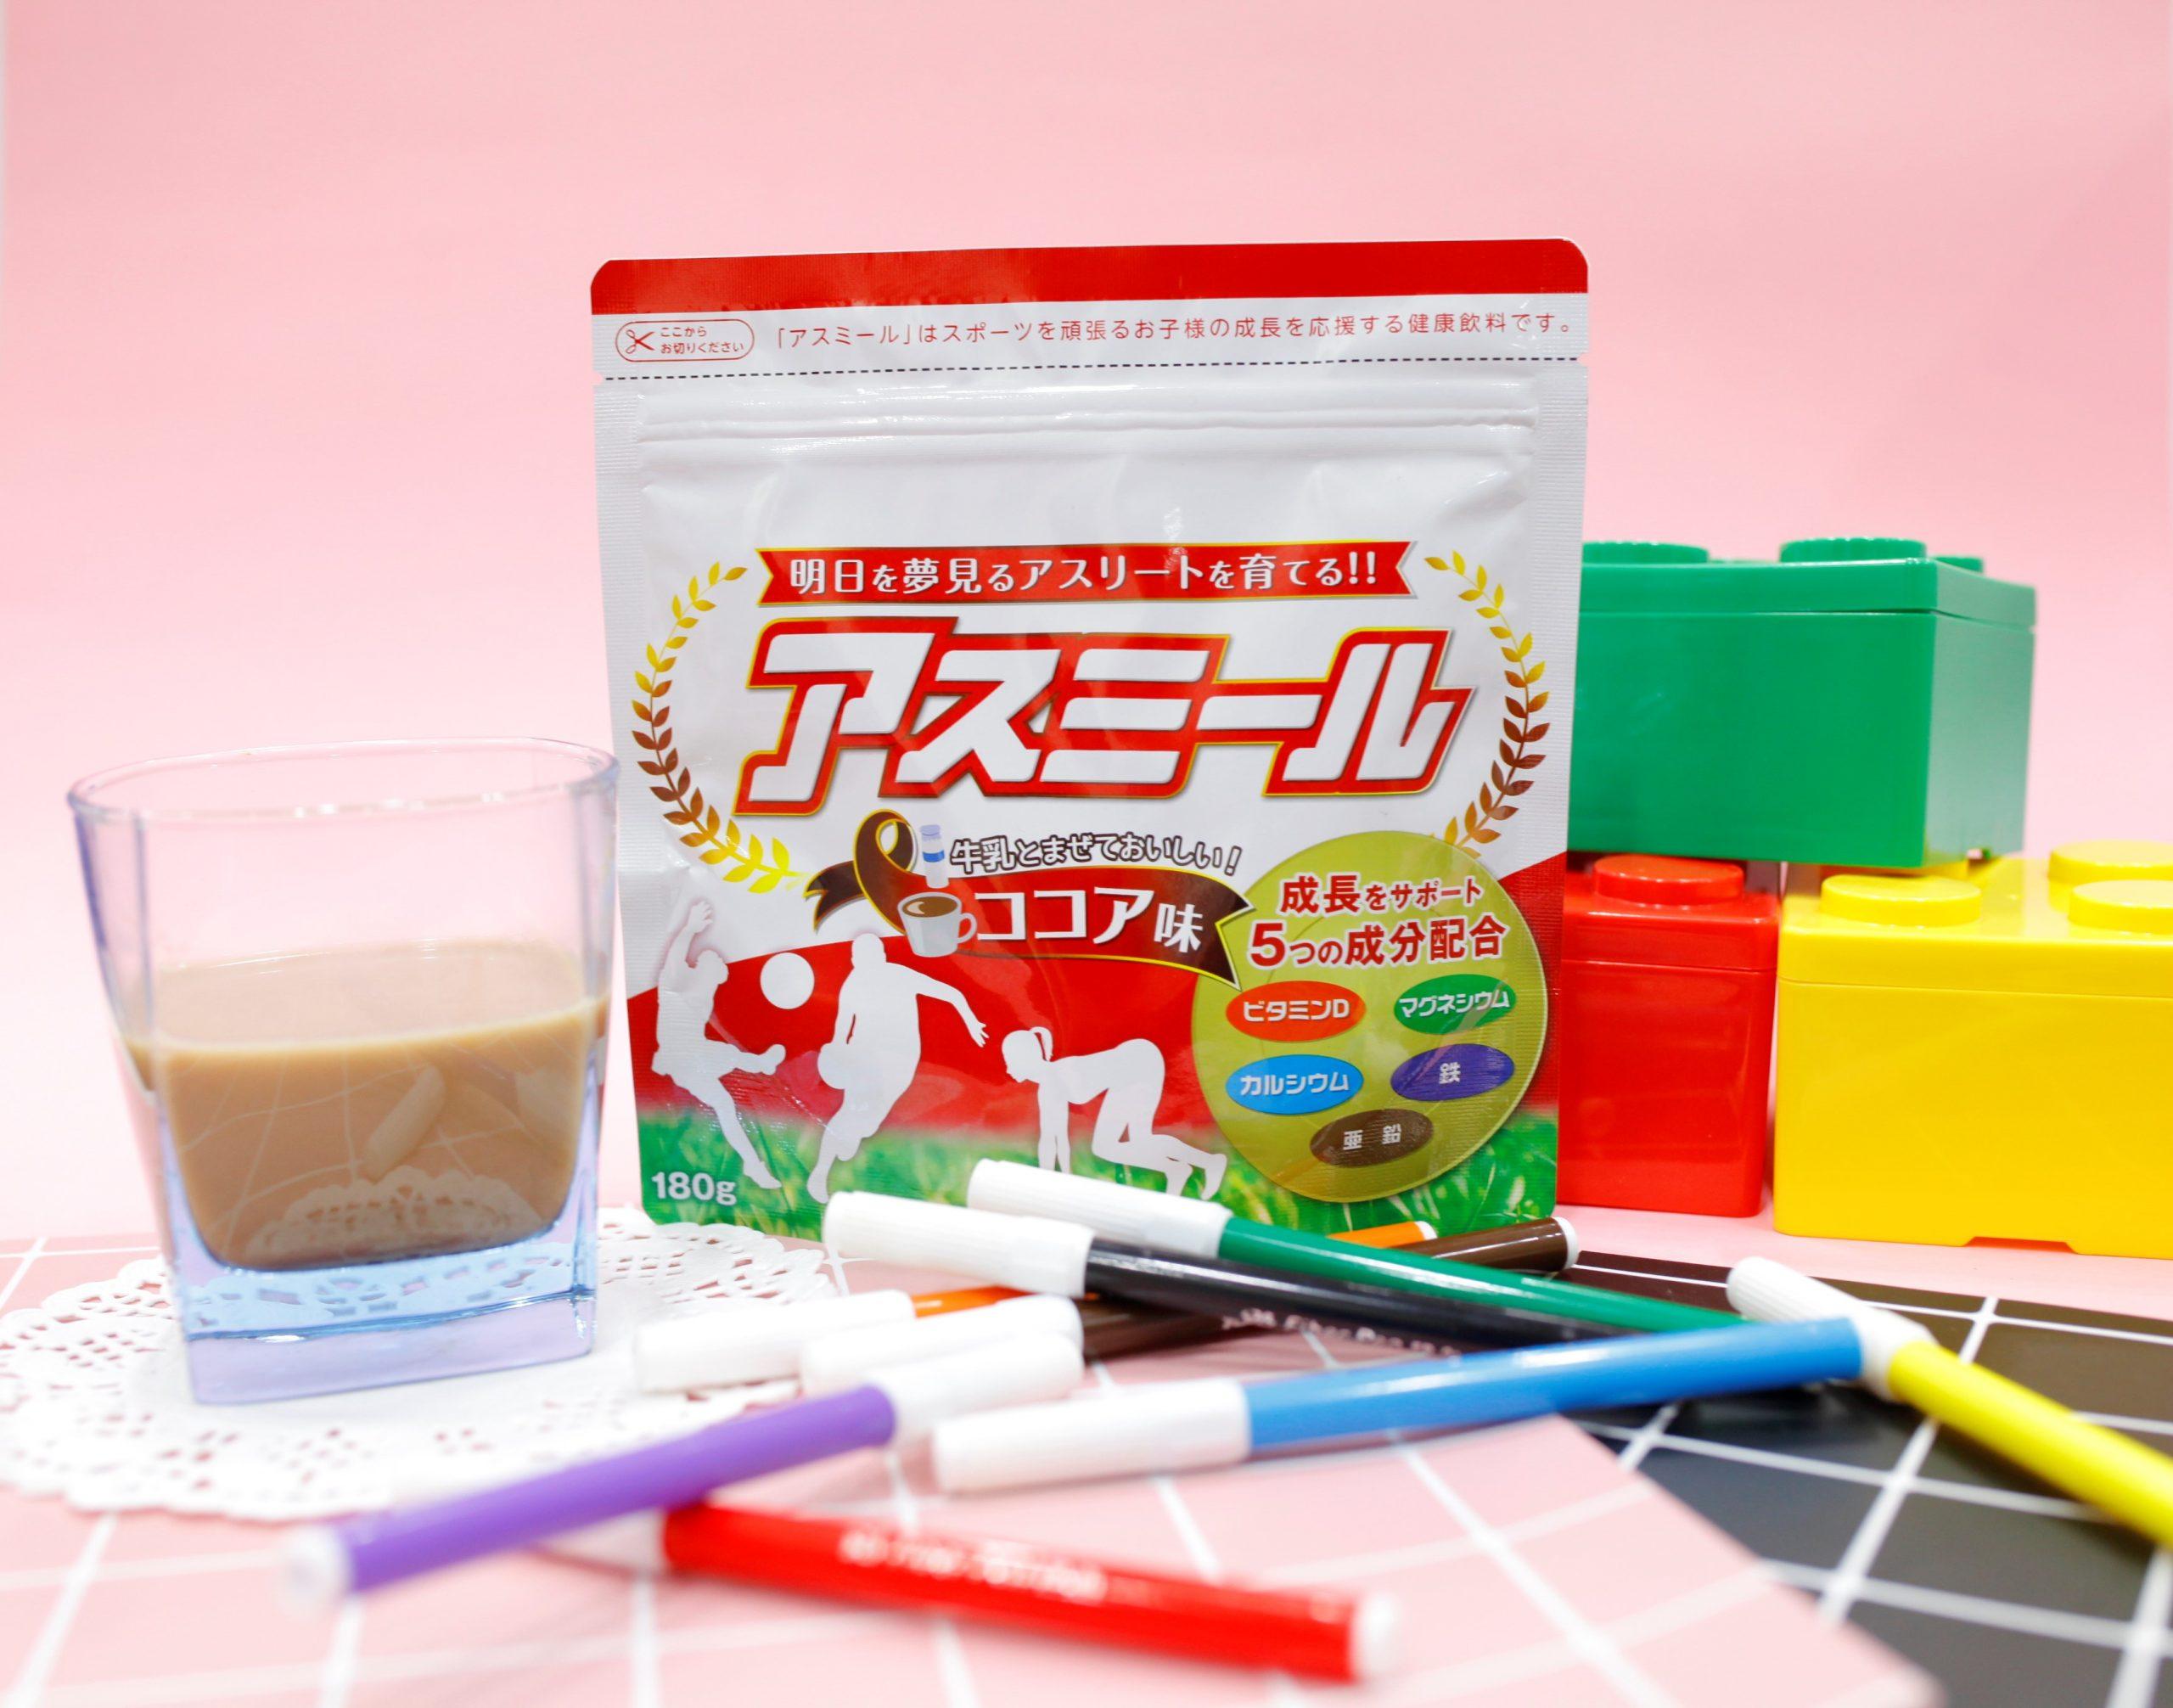 Sữa Asumiru bổ sung canxi từ san hô